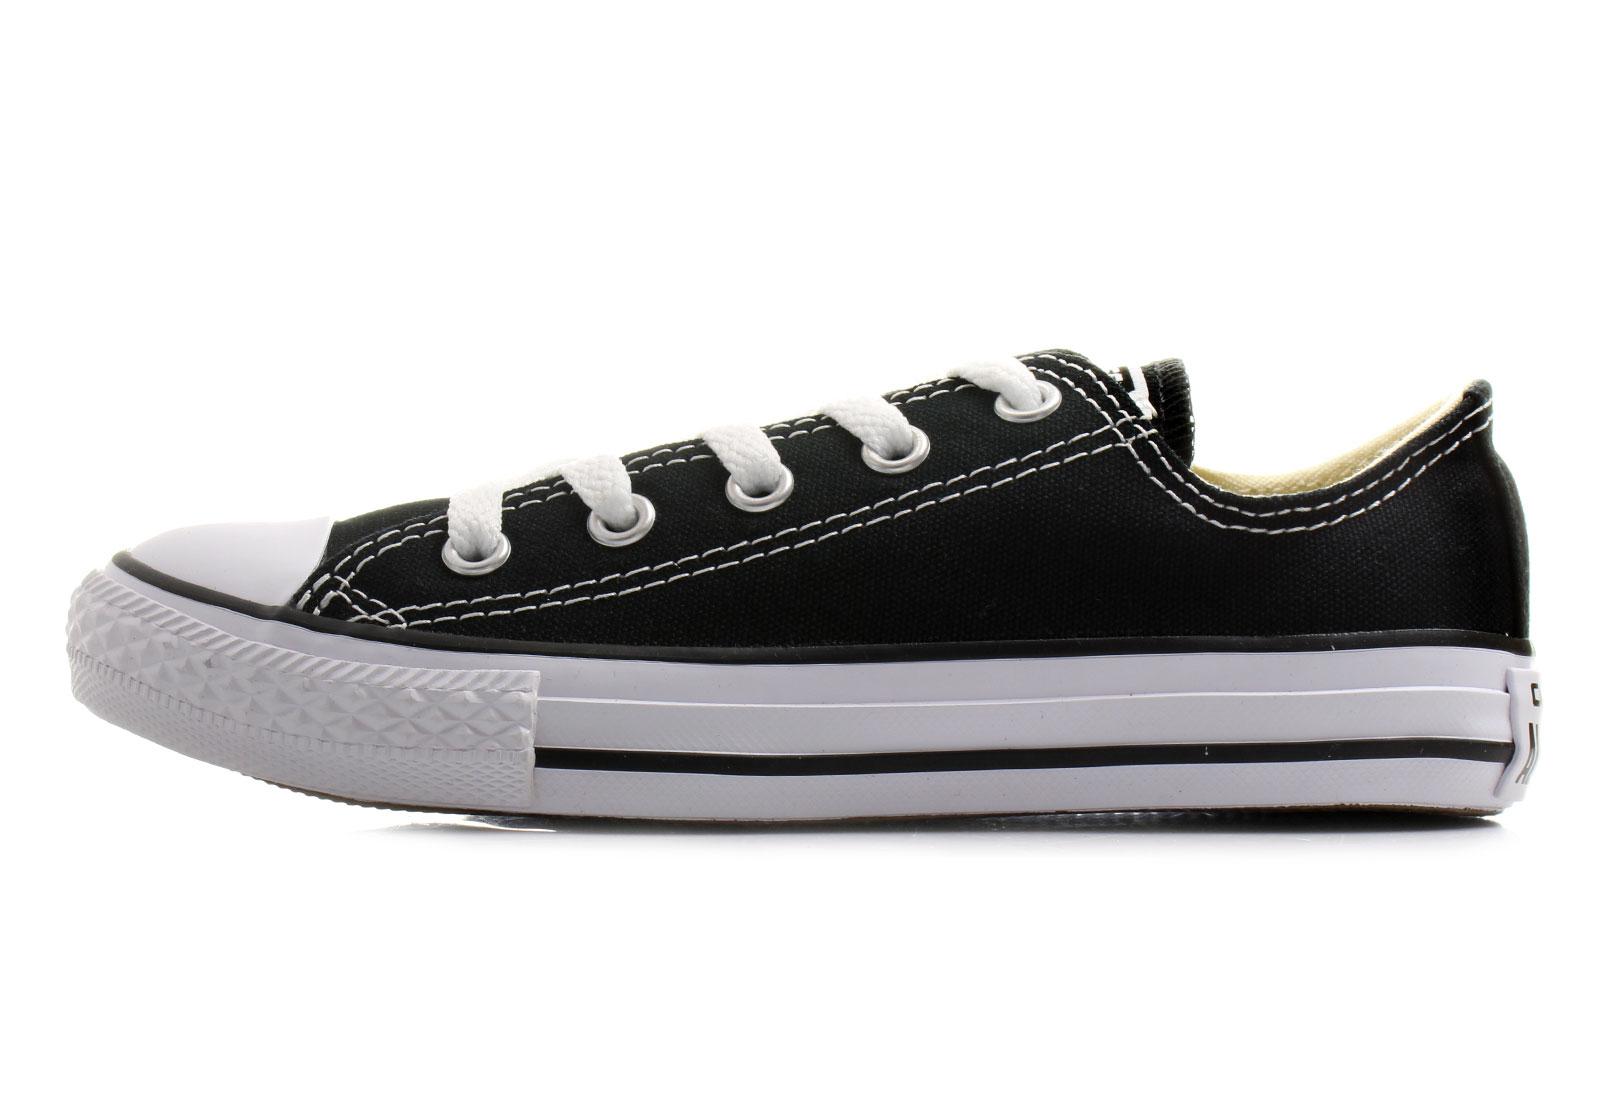 Converse Sneakers - Ct As Kids Core Ox - 3J235C - Online shop for ... 948182d190